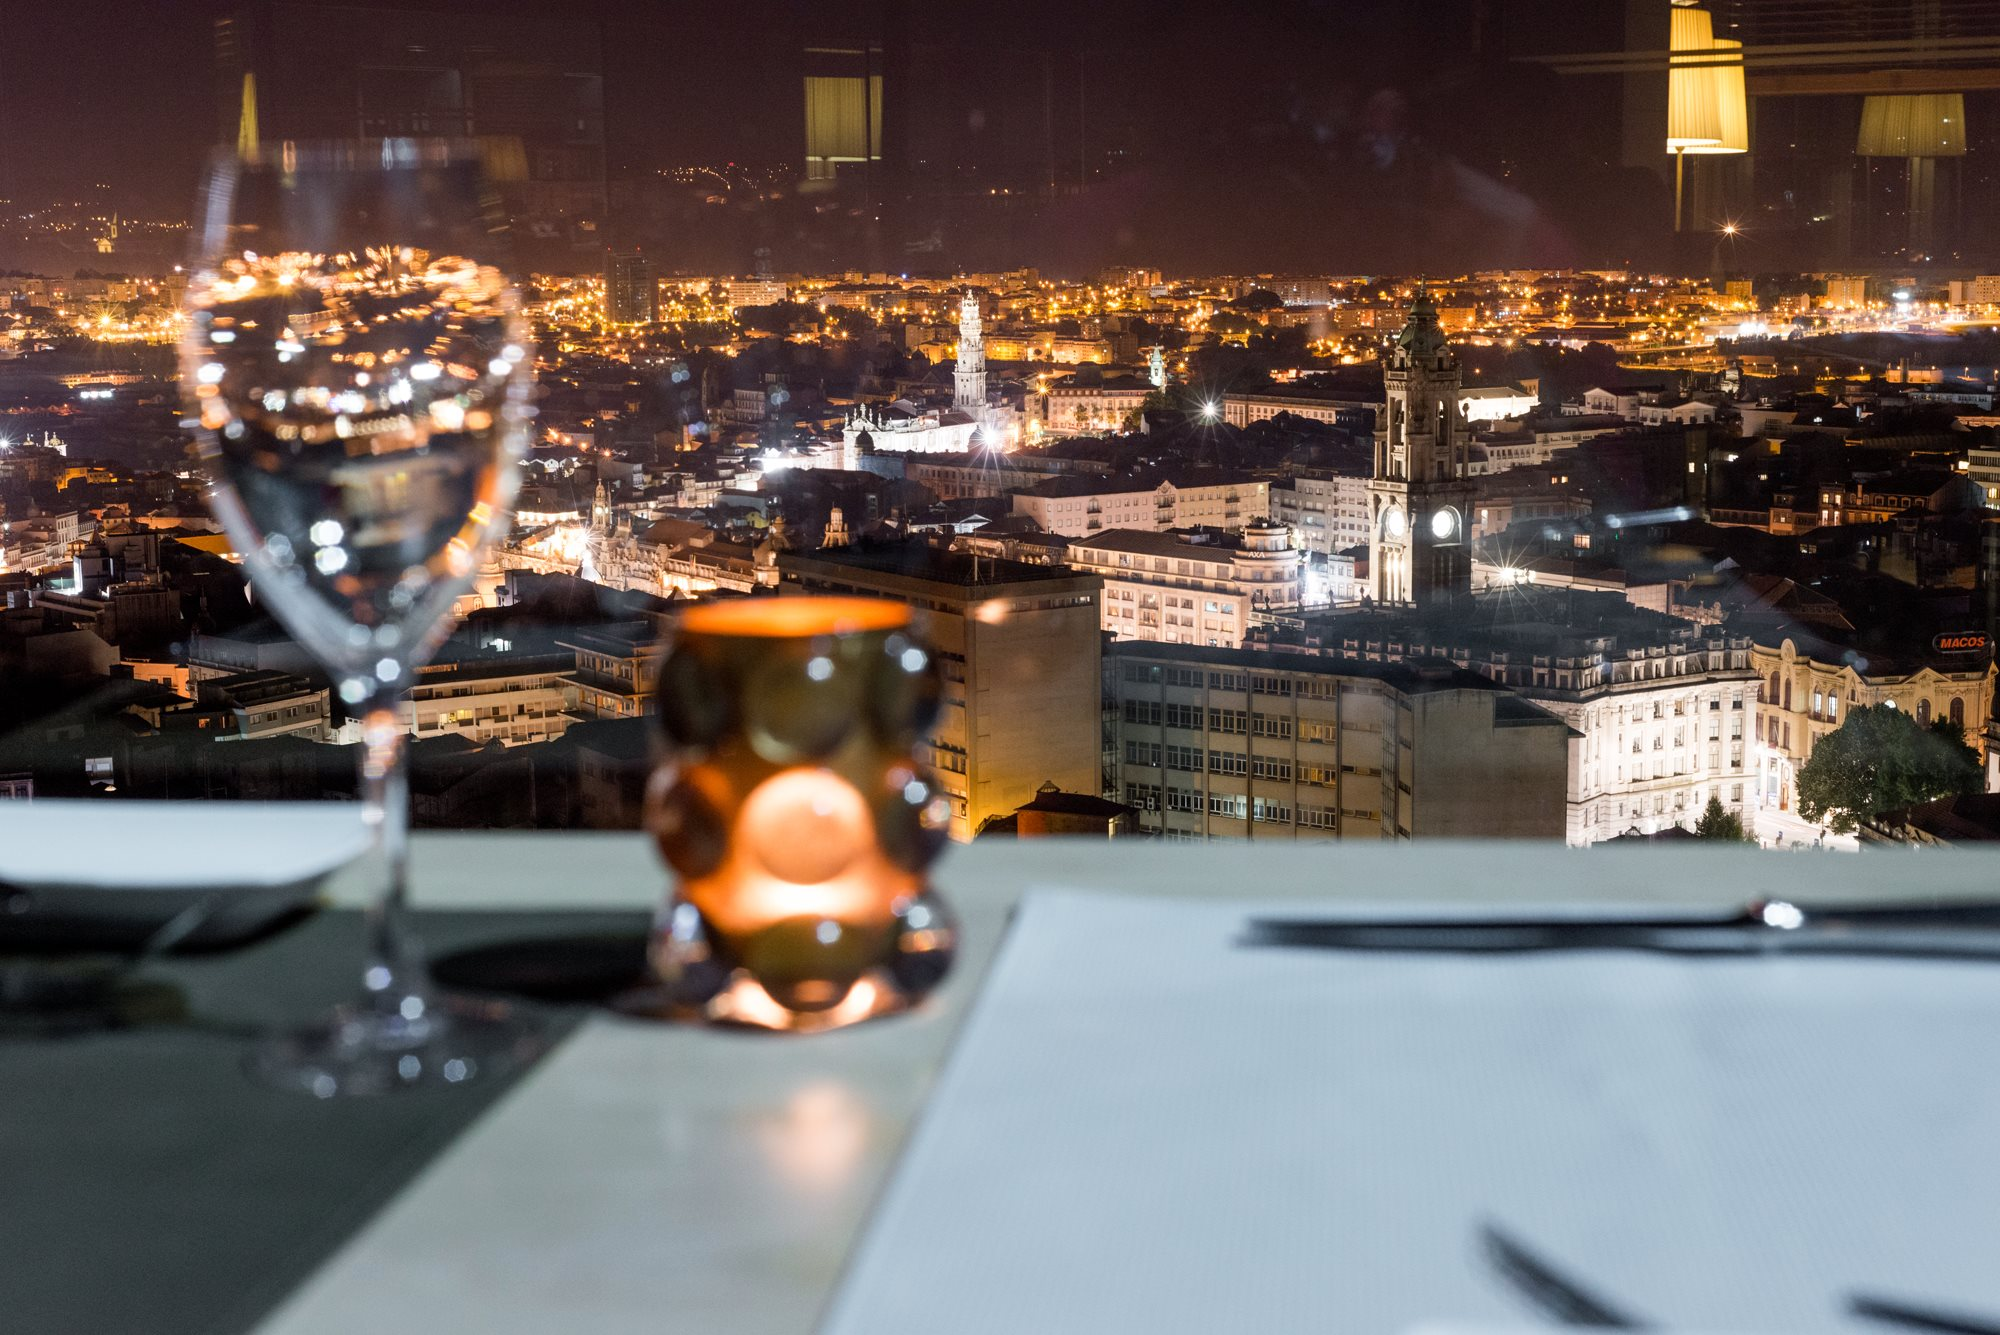 Terrasse - Rooftop - 17 Restaurante Bar - Hotel Dom Henrique Downtown - Porto